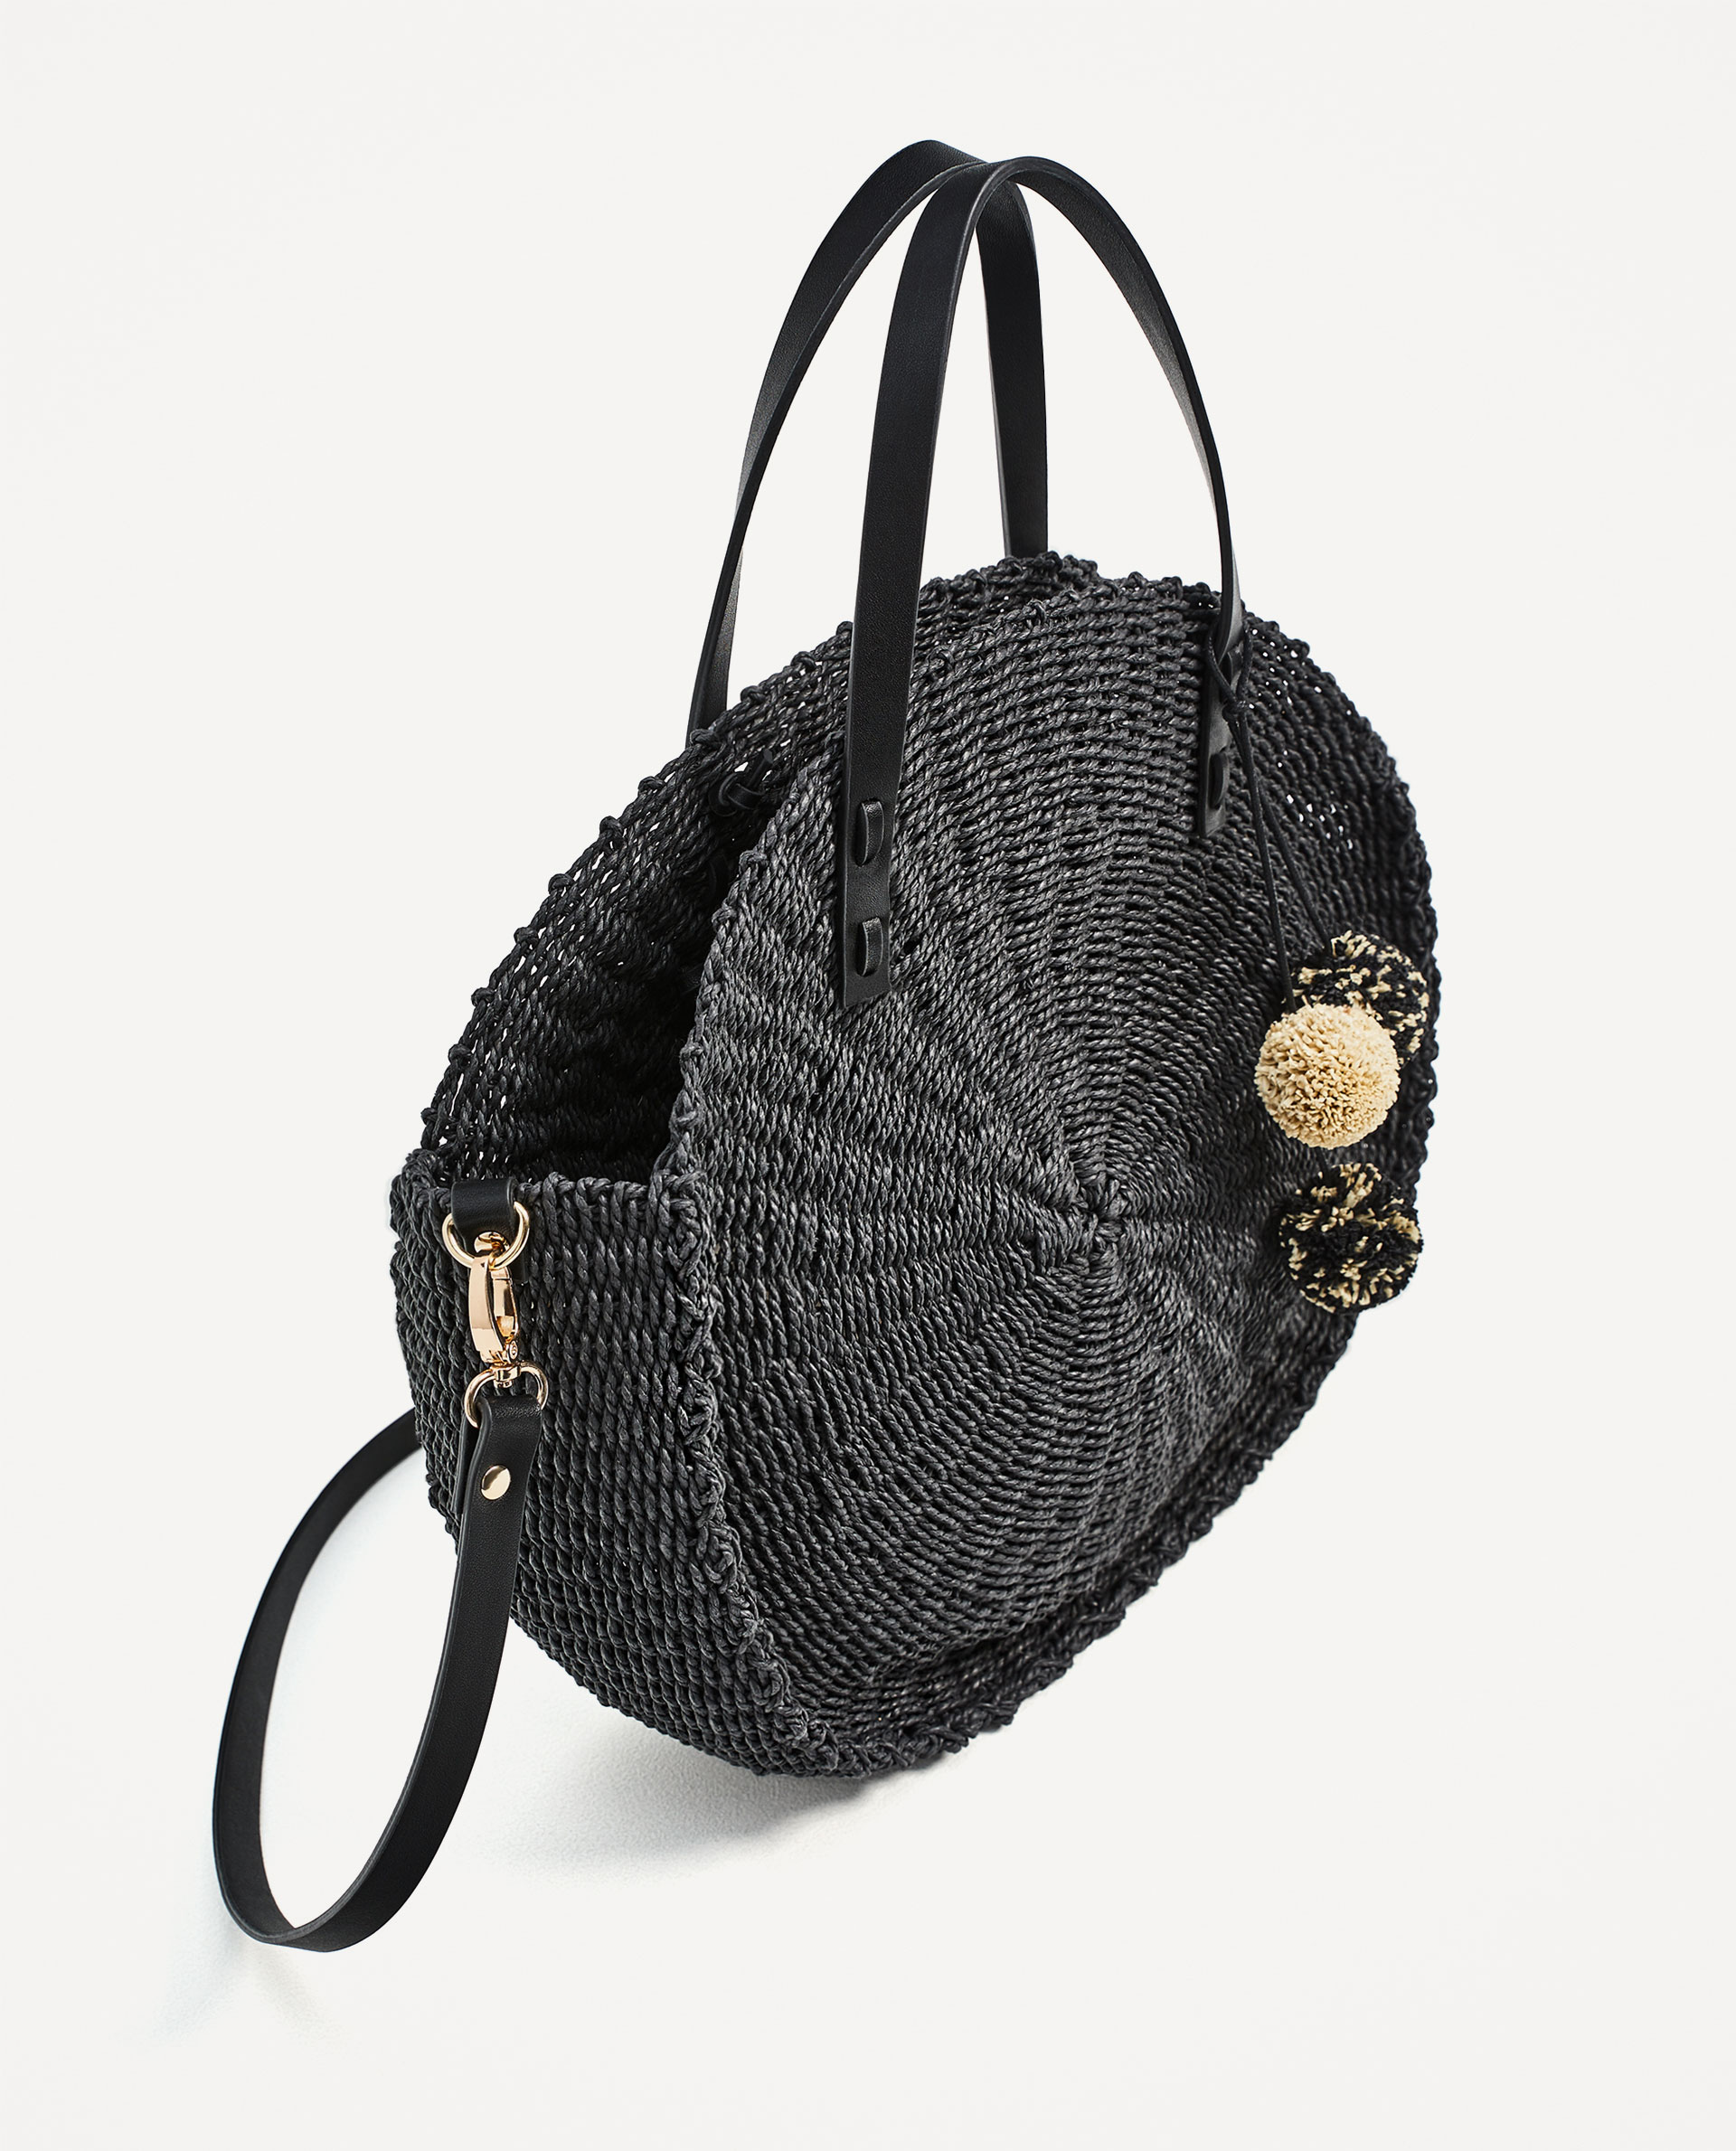 Braided Tote Bag with pom-poms, $49.90